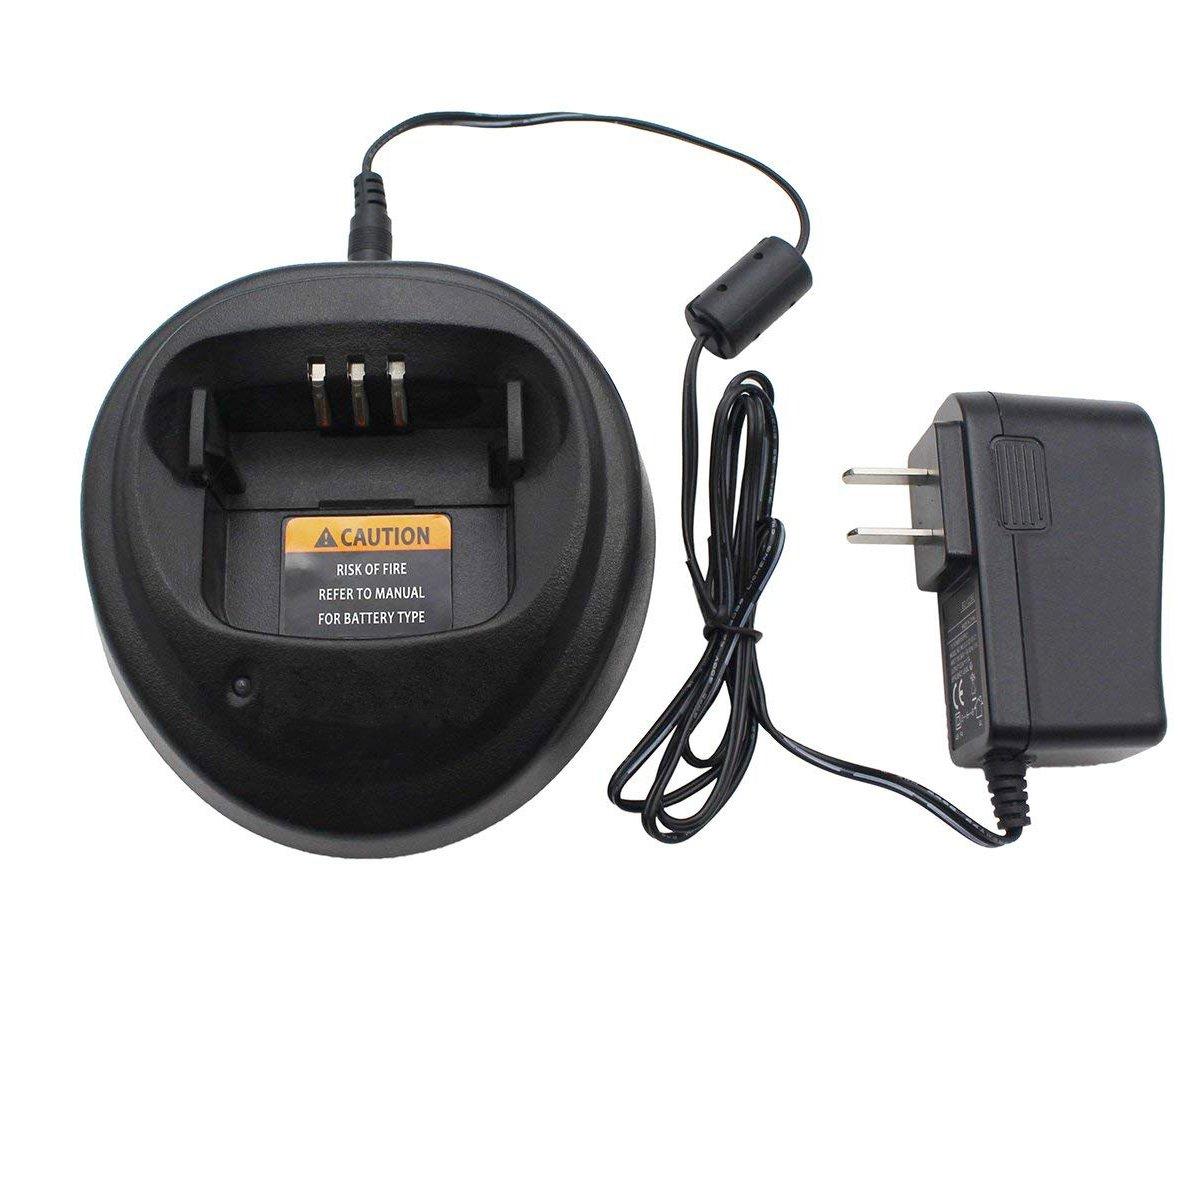 abcGoodefg Ni-MH Ni-CD Li-ion Battery Rapid Quick Charger For Motorola Radios CP040 CP140 CP150 CP160 CP180 CP340 CP360 CP380 GP3138 GP3688 PM400 PR400 EP450 RQC-MT-3P